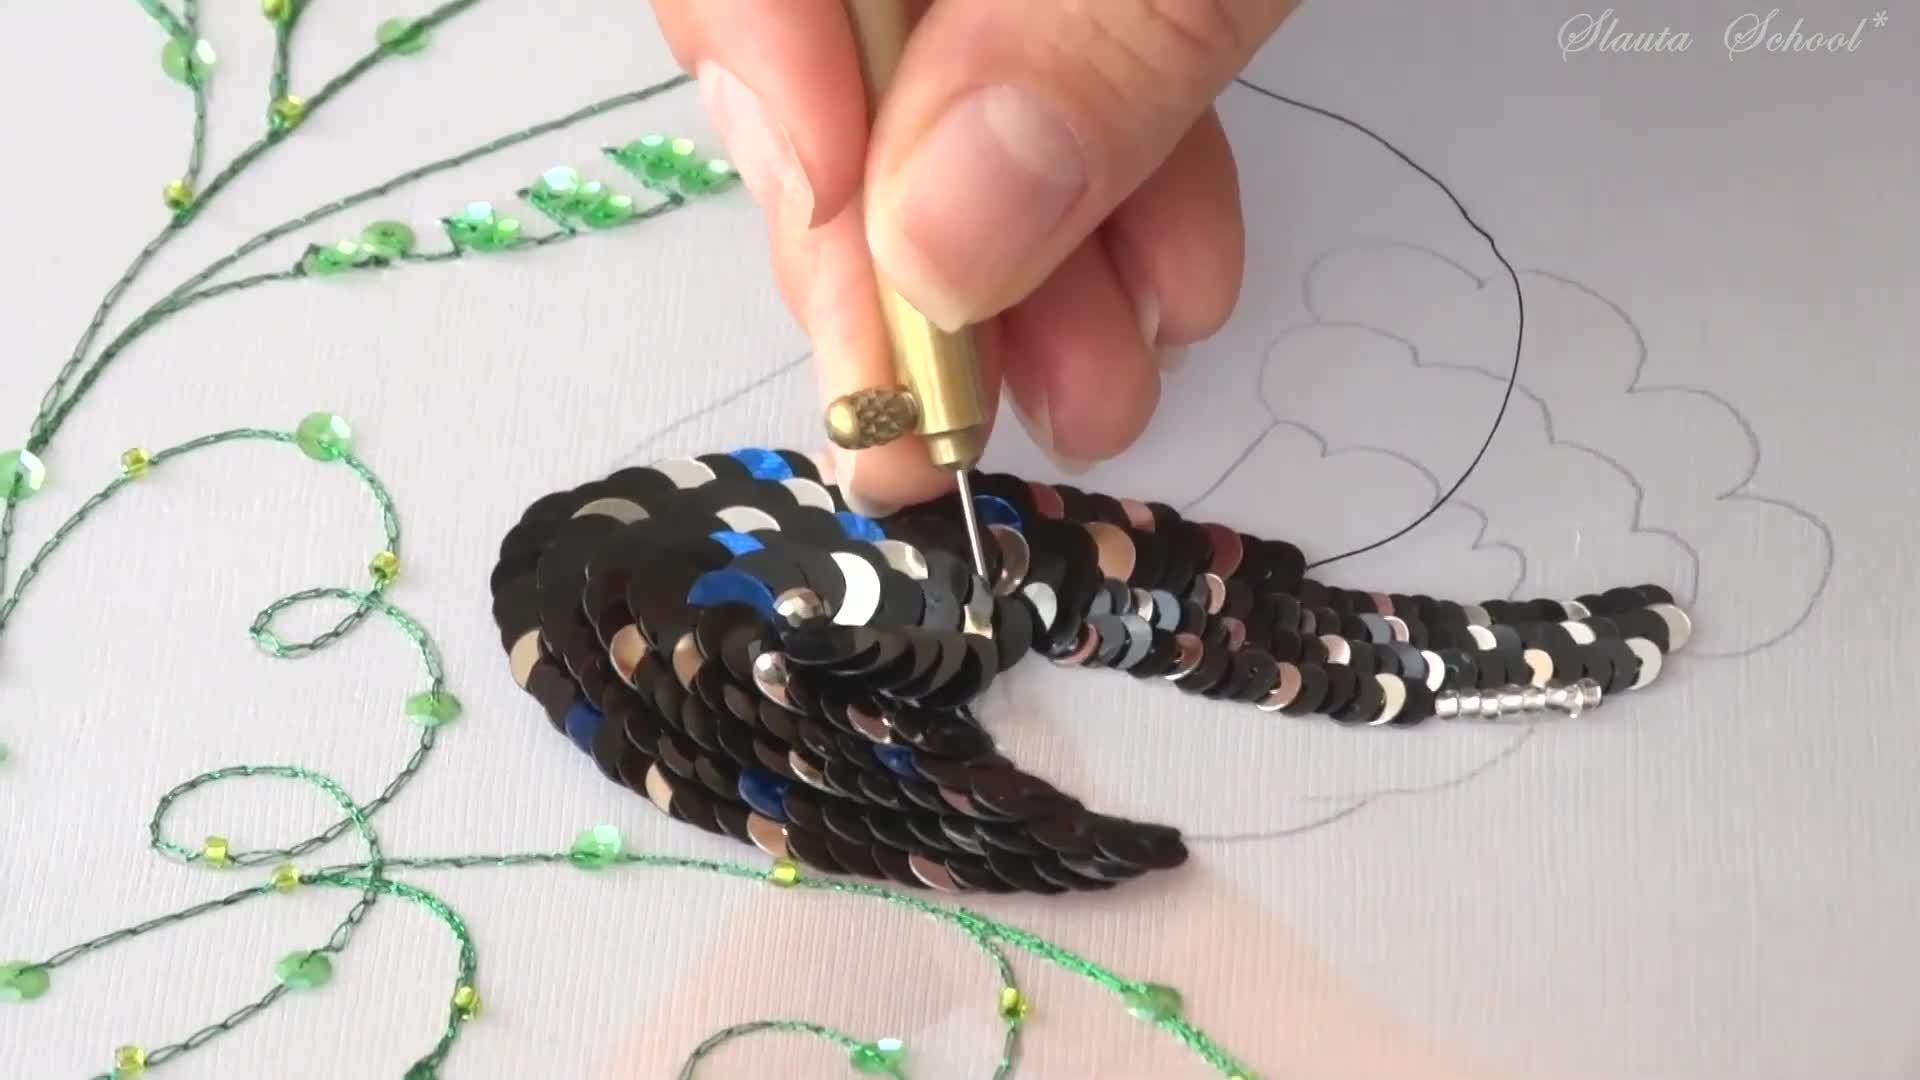 DIY Luneville法式刺绣视频教程(专业级 第八课)